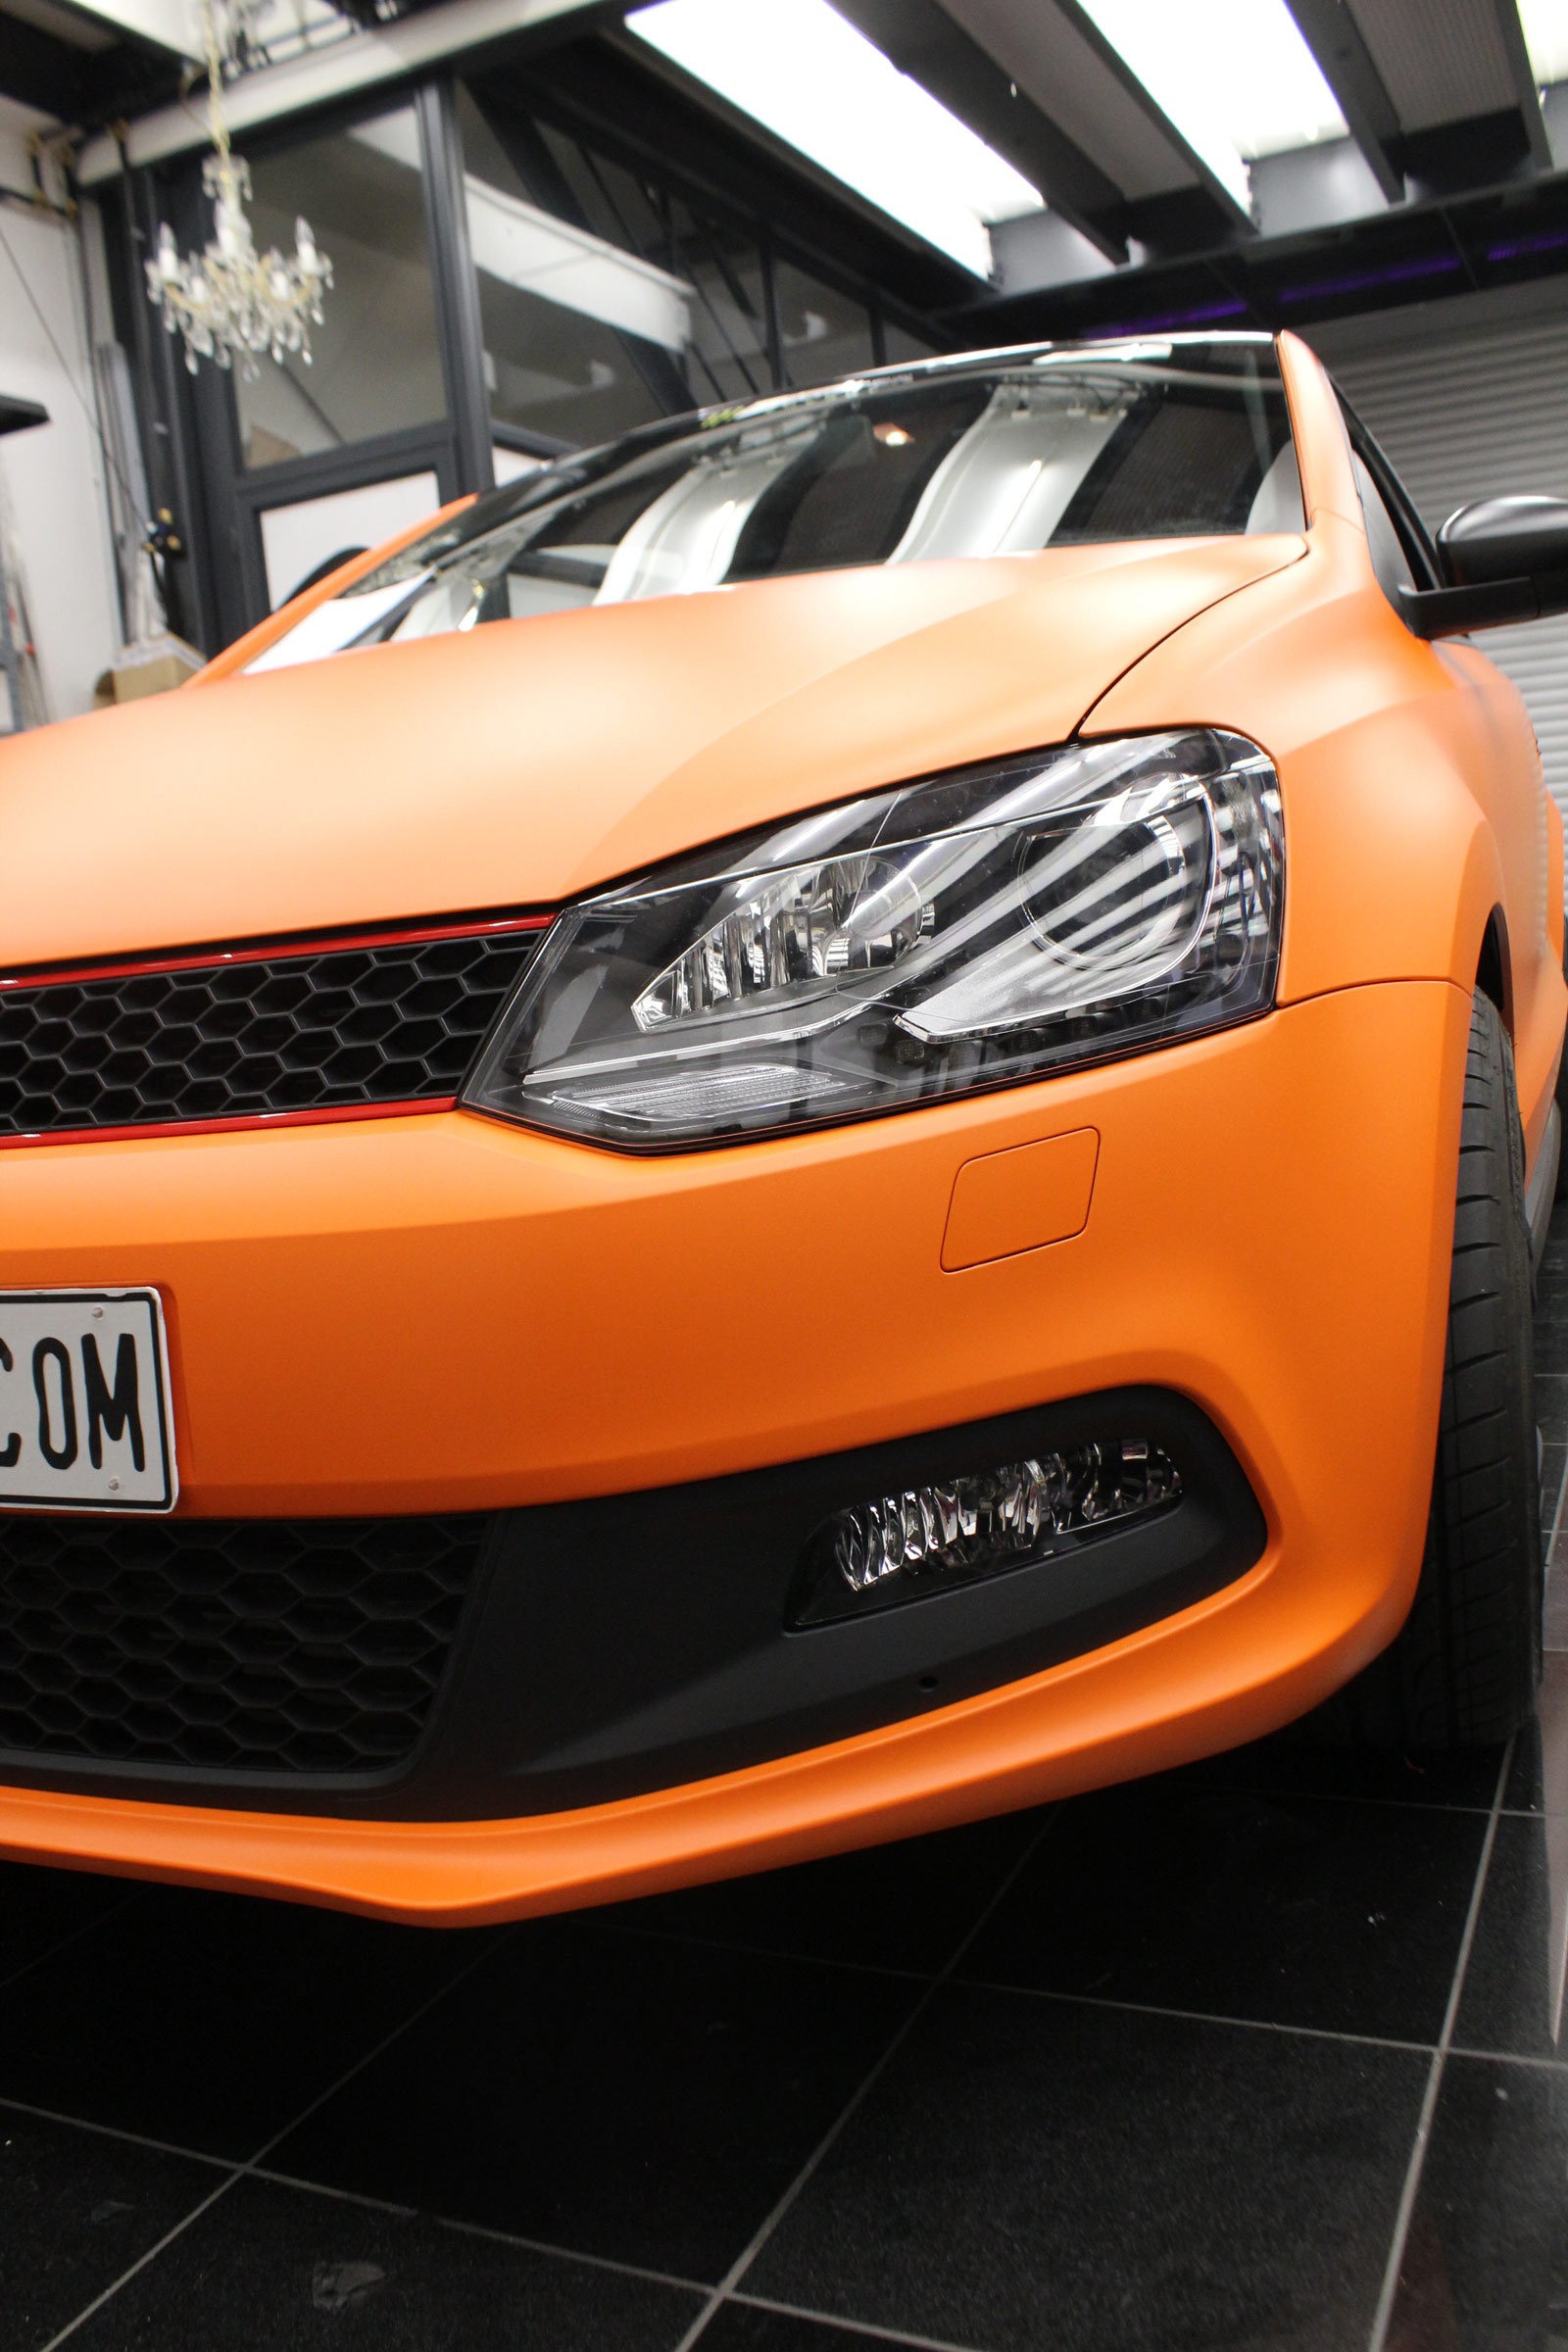 VW_Polo_GTI_Folierung_Orange_Matt_13